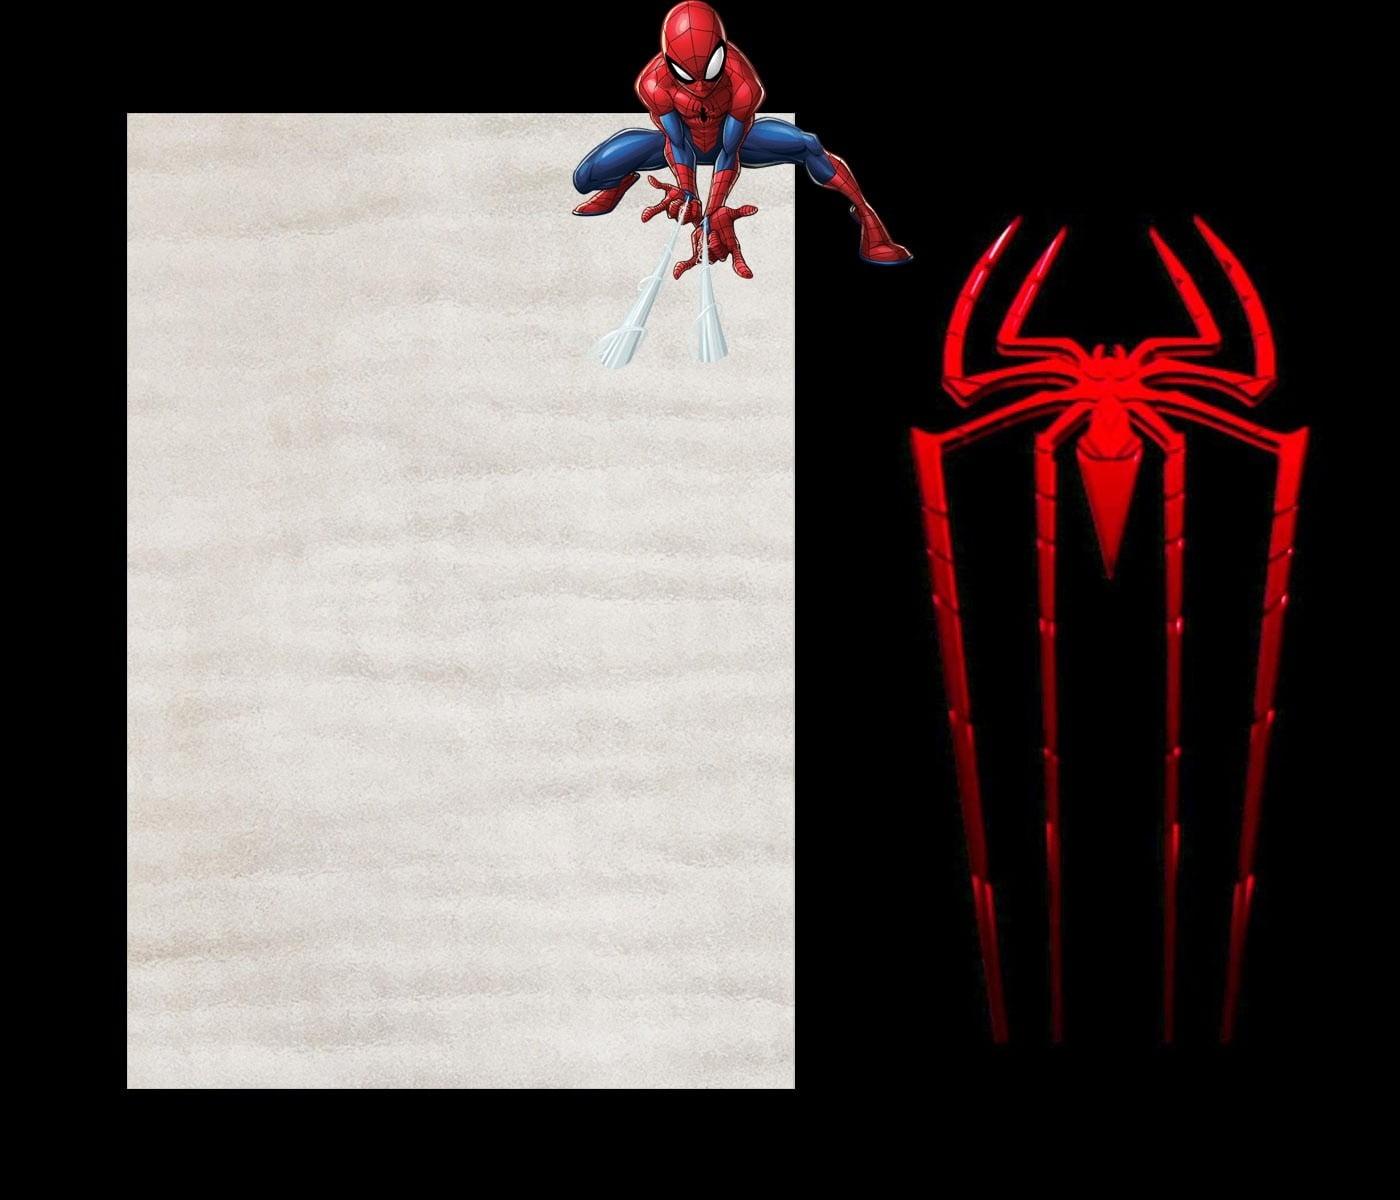 Spiderman Invitation Template Site Image Spiderman Invitation